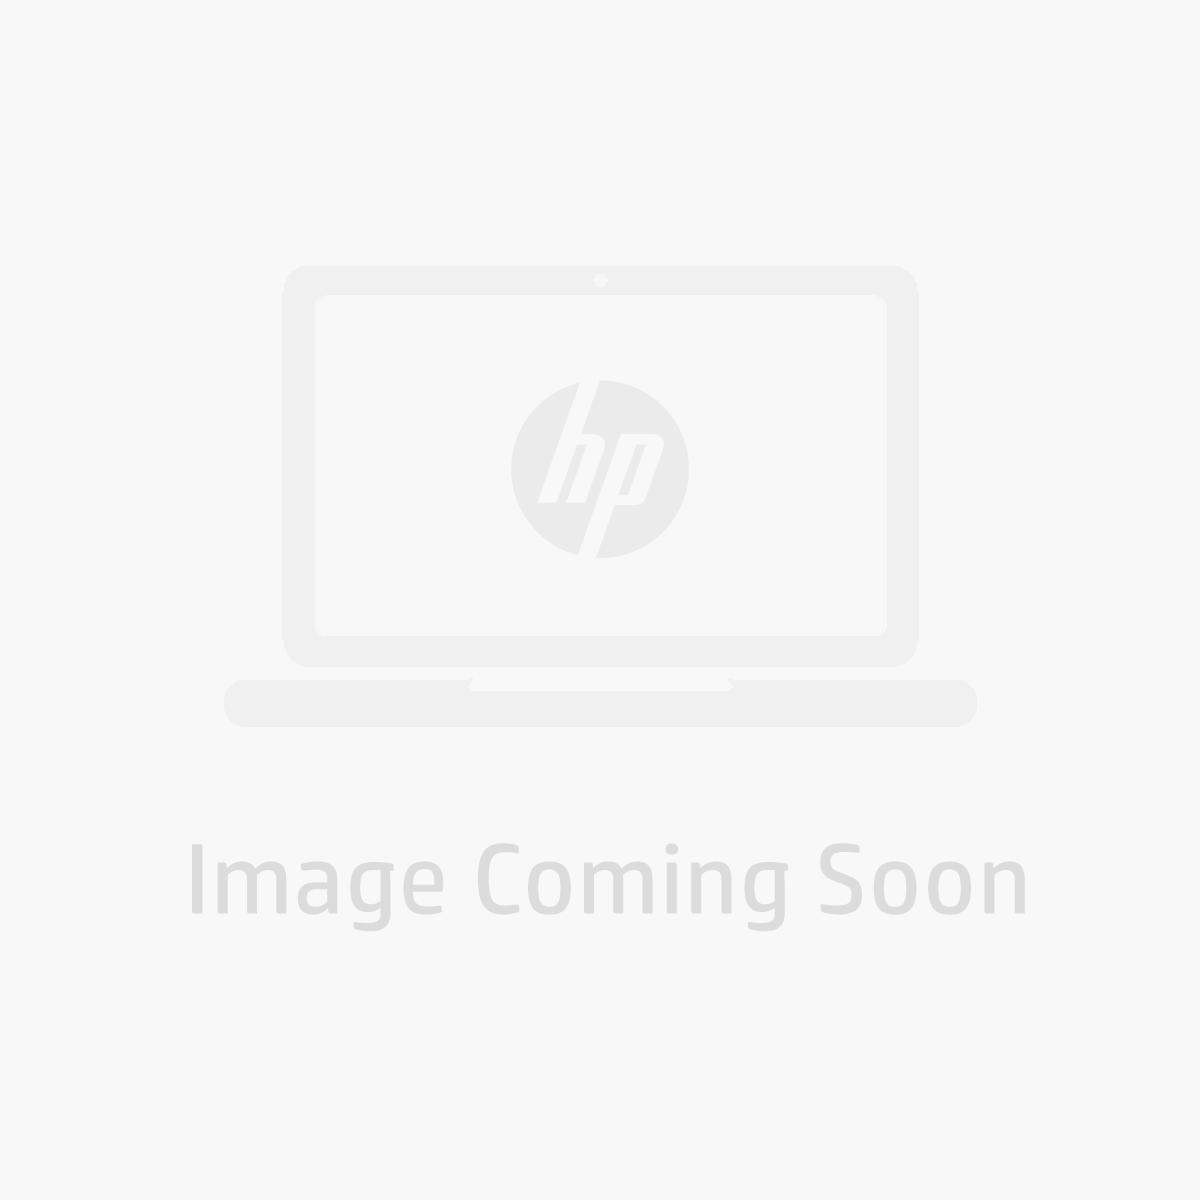 HP Z4 i9 G4 Workstation